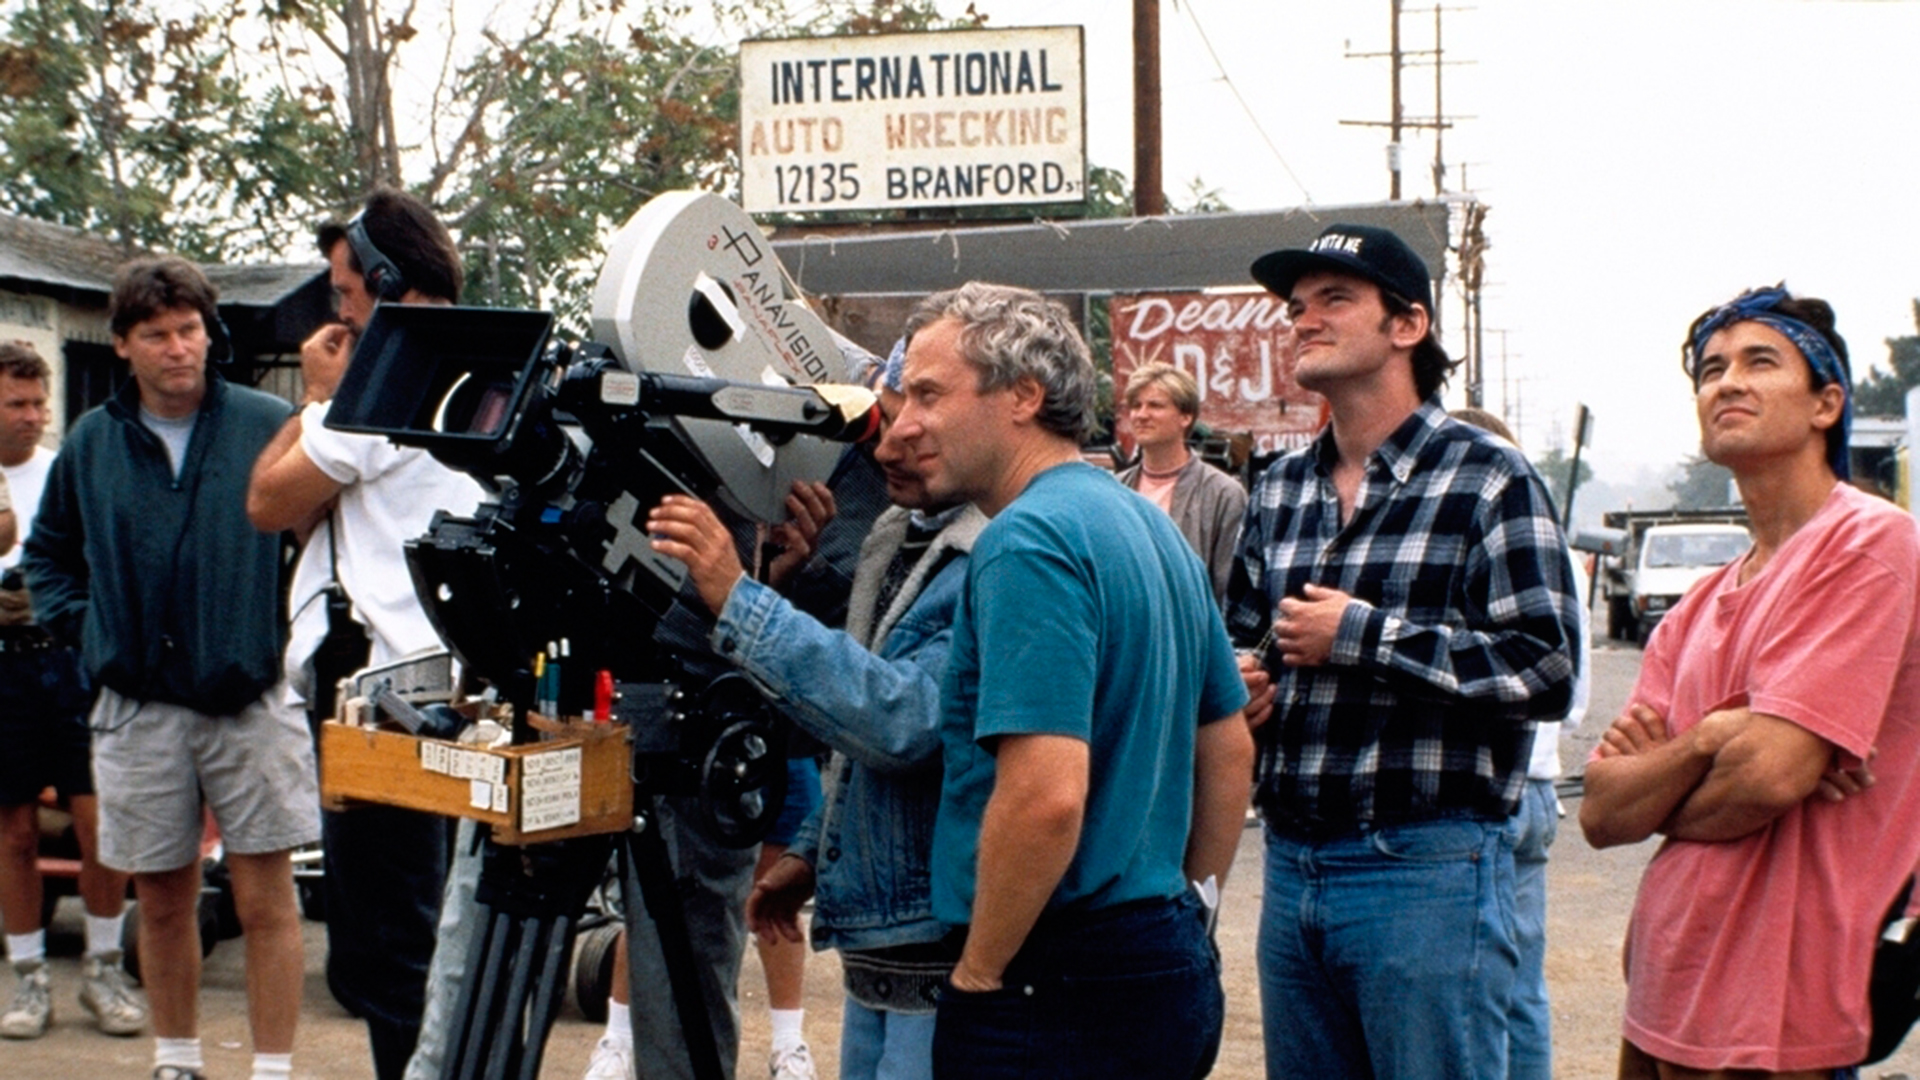 Pulp Fiction cinematographer Andrzej Sekula with Quentin Tarantino